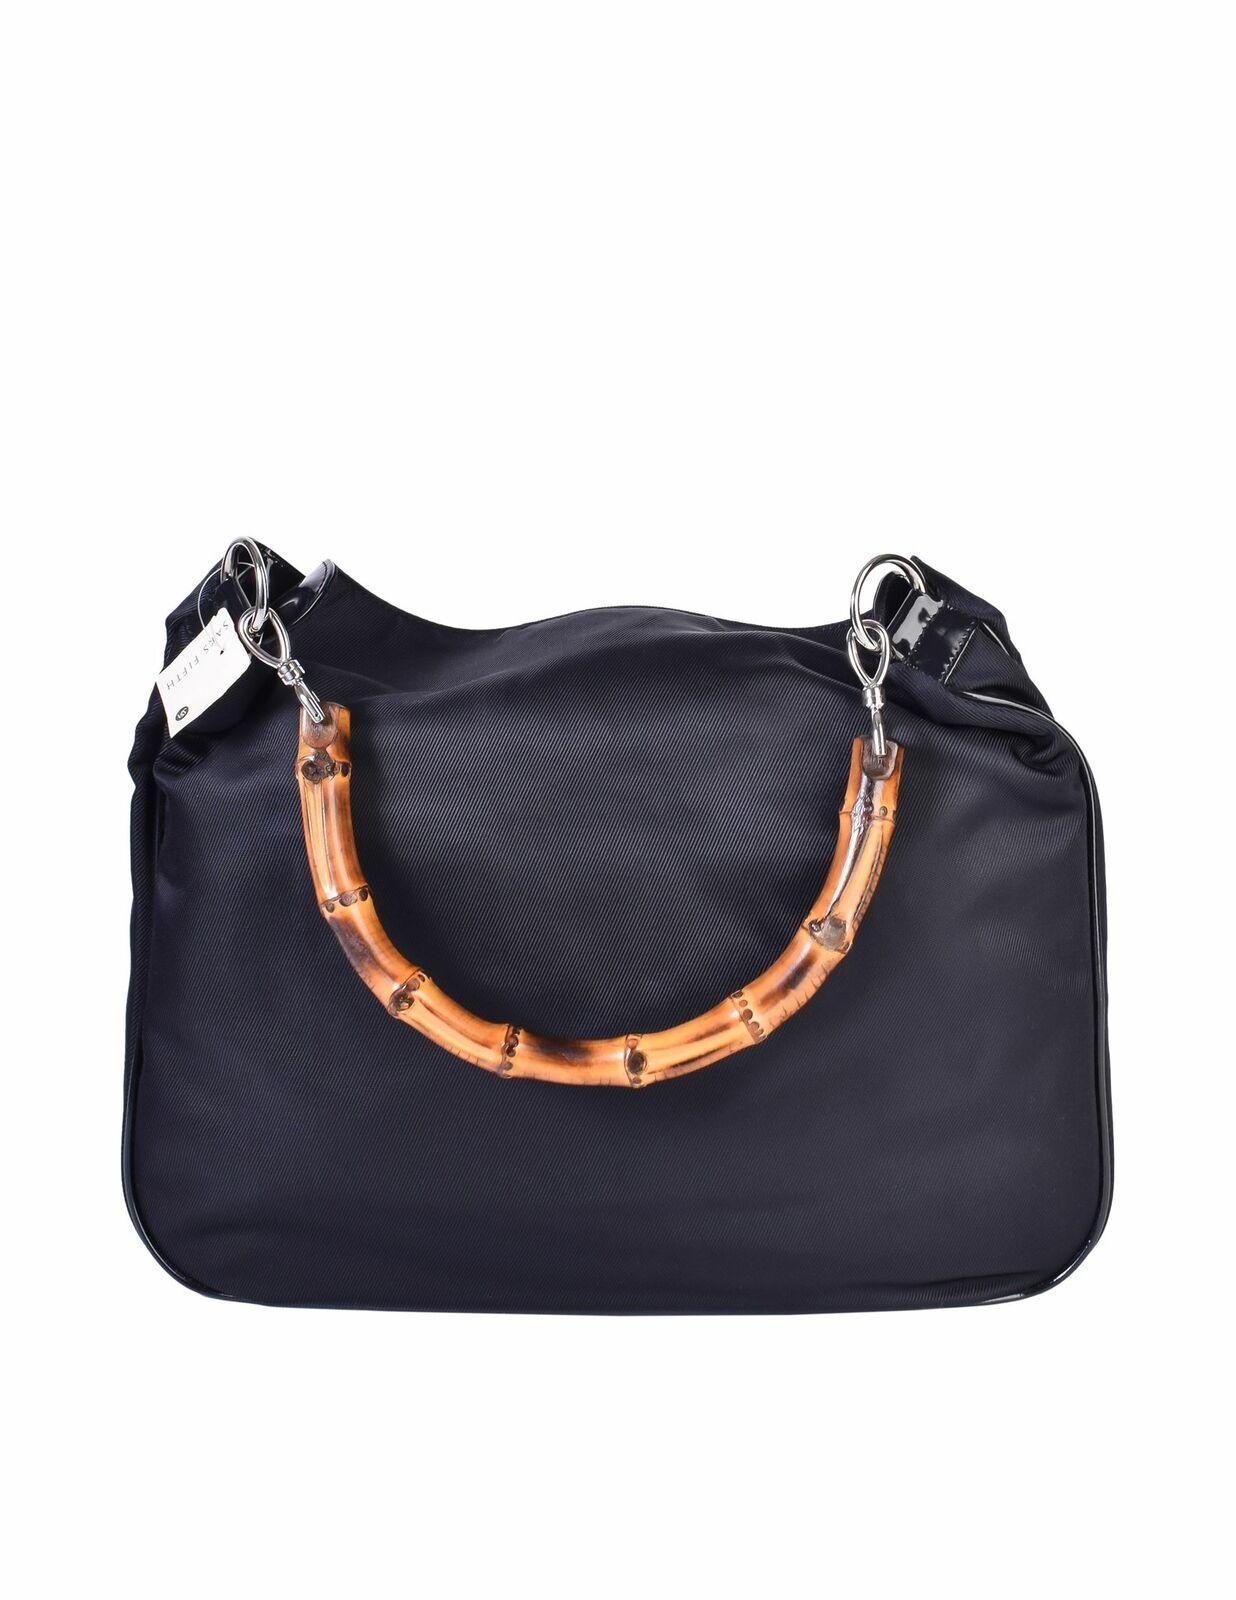 Gucci Vintage Large Navy Blue Nylon Patent Leathe… - image 6